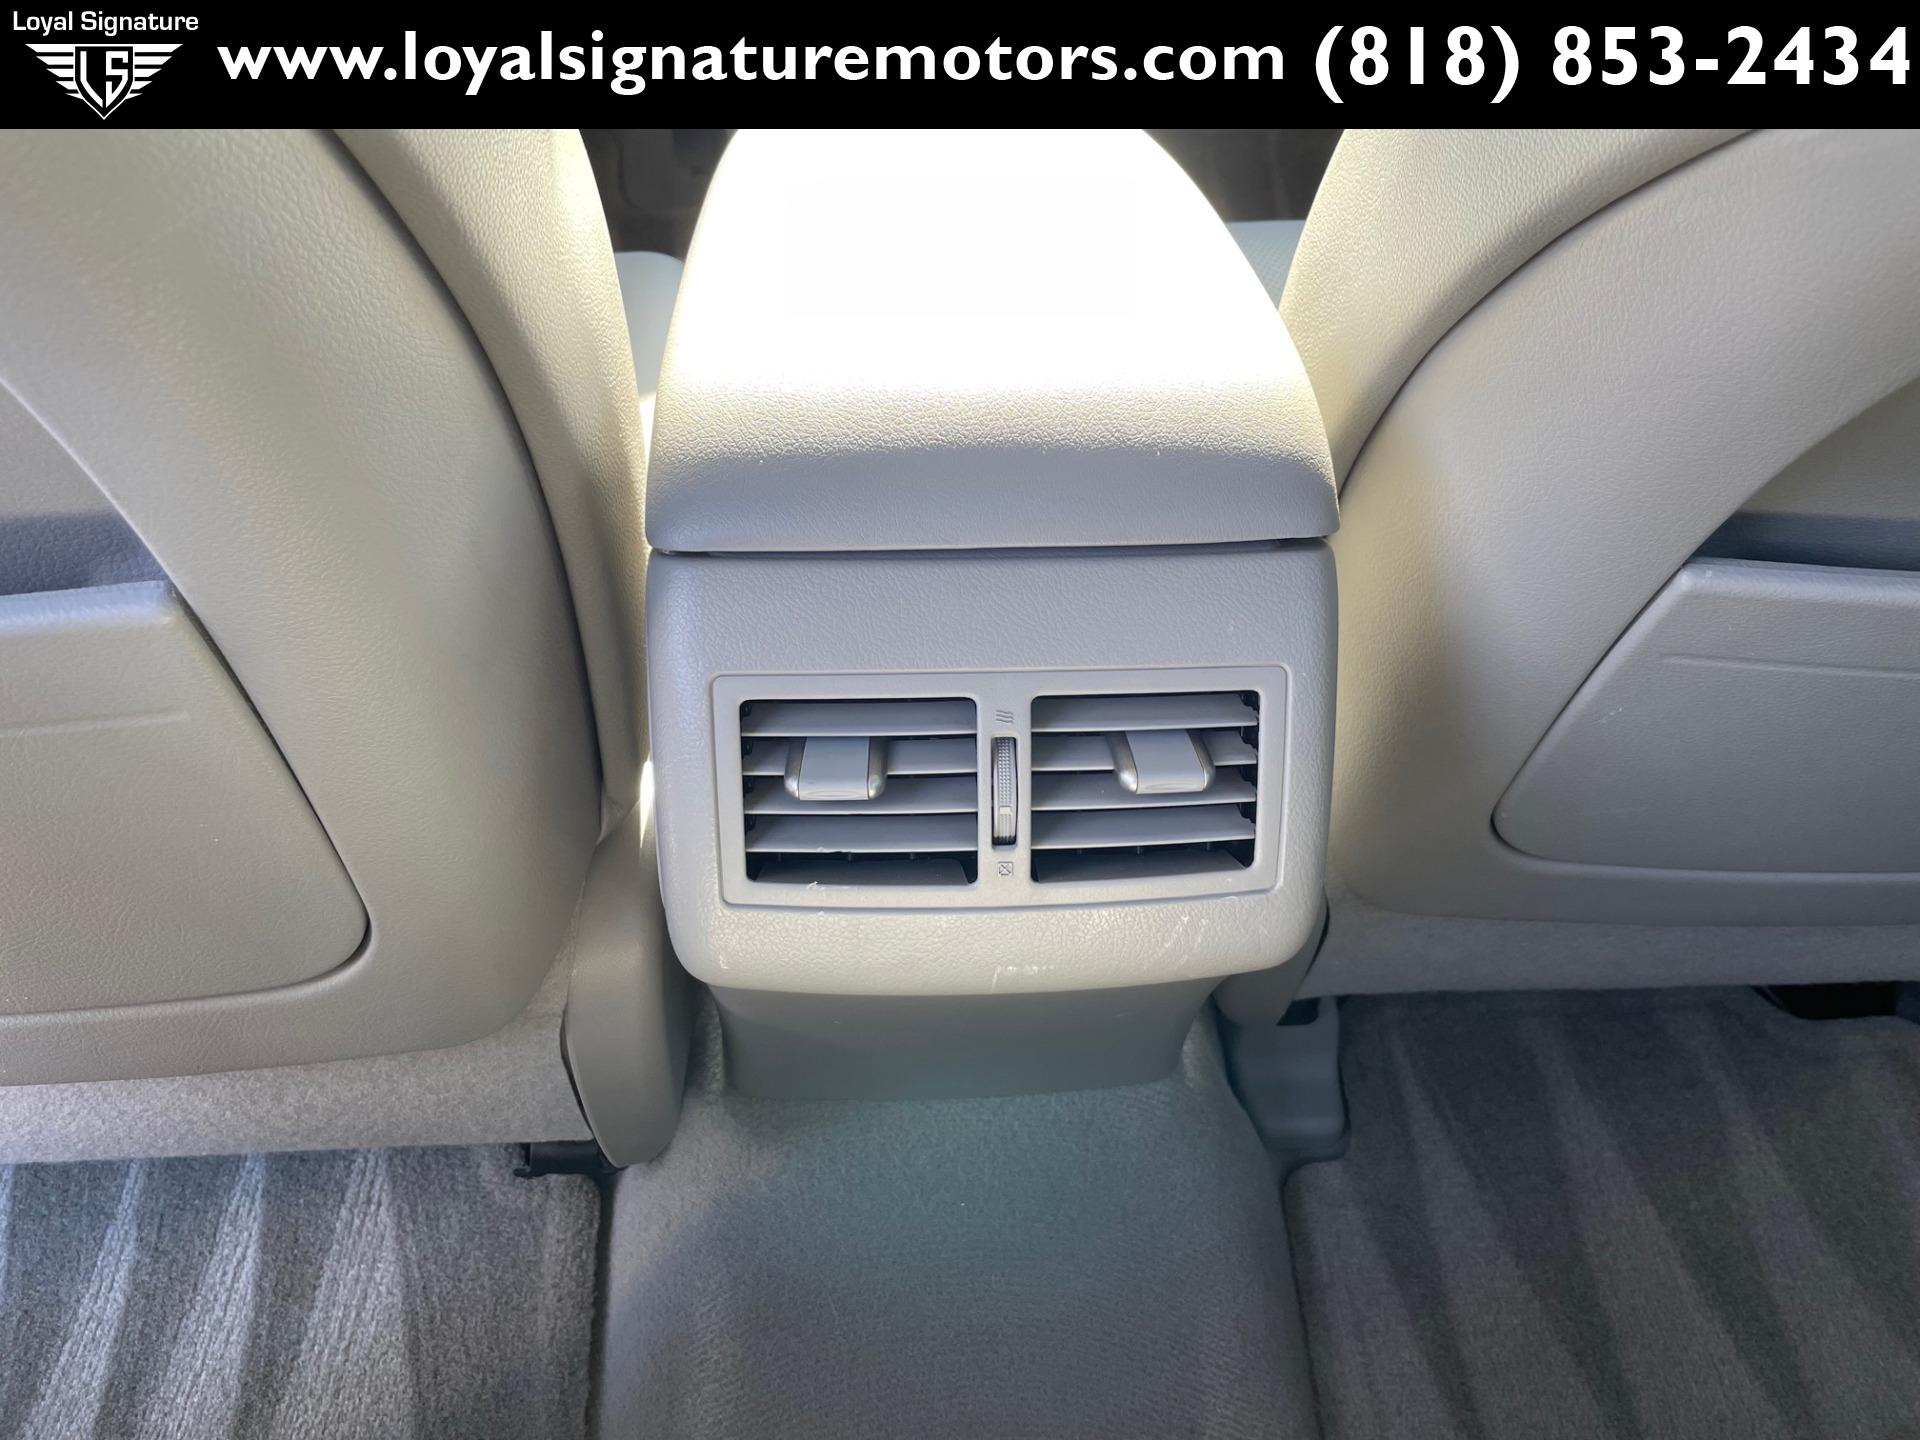 Used-2007-Toyota-Camry-Hybrid